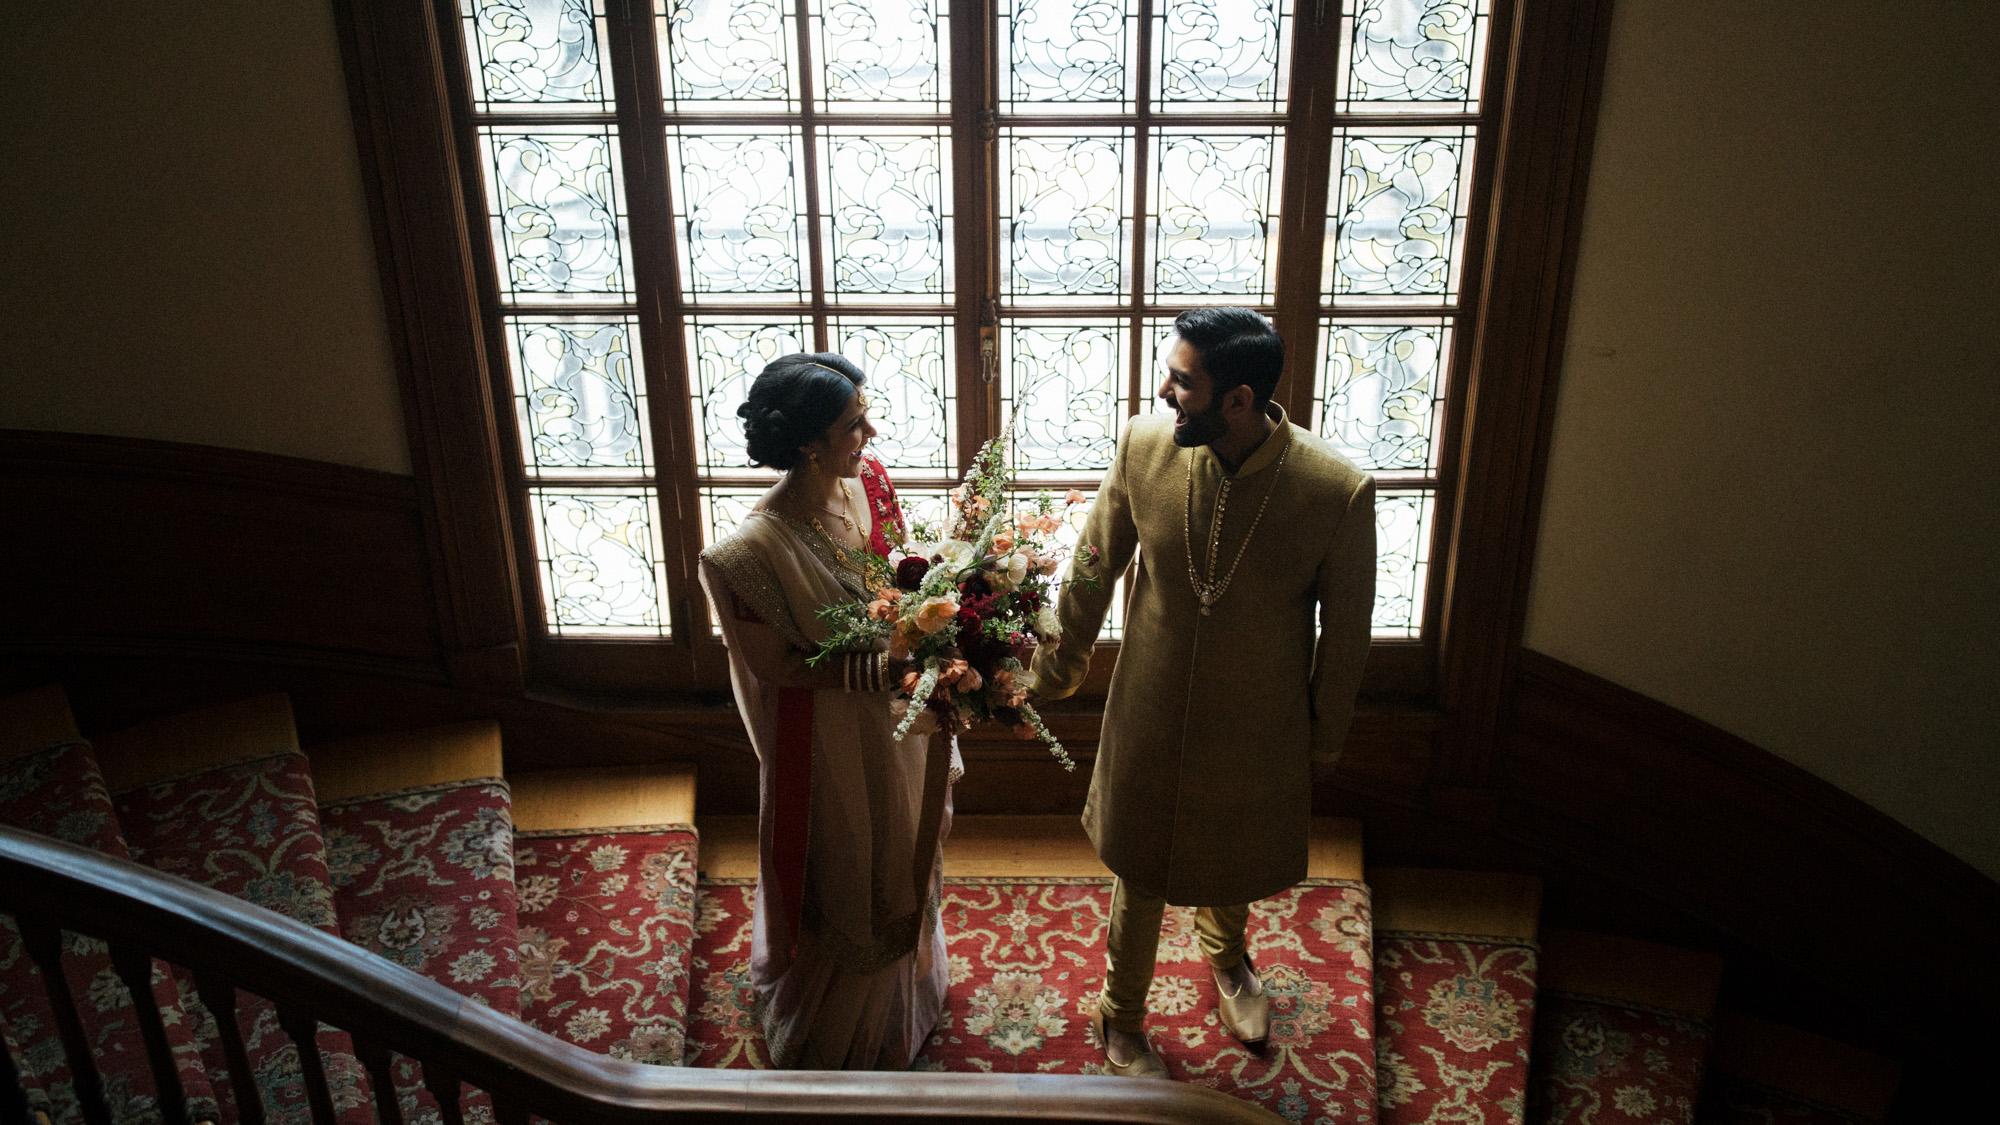 anu_maneesh_alec_vanderboom_Indian_wedding_photography-0052.jpg